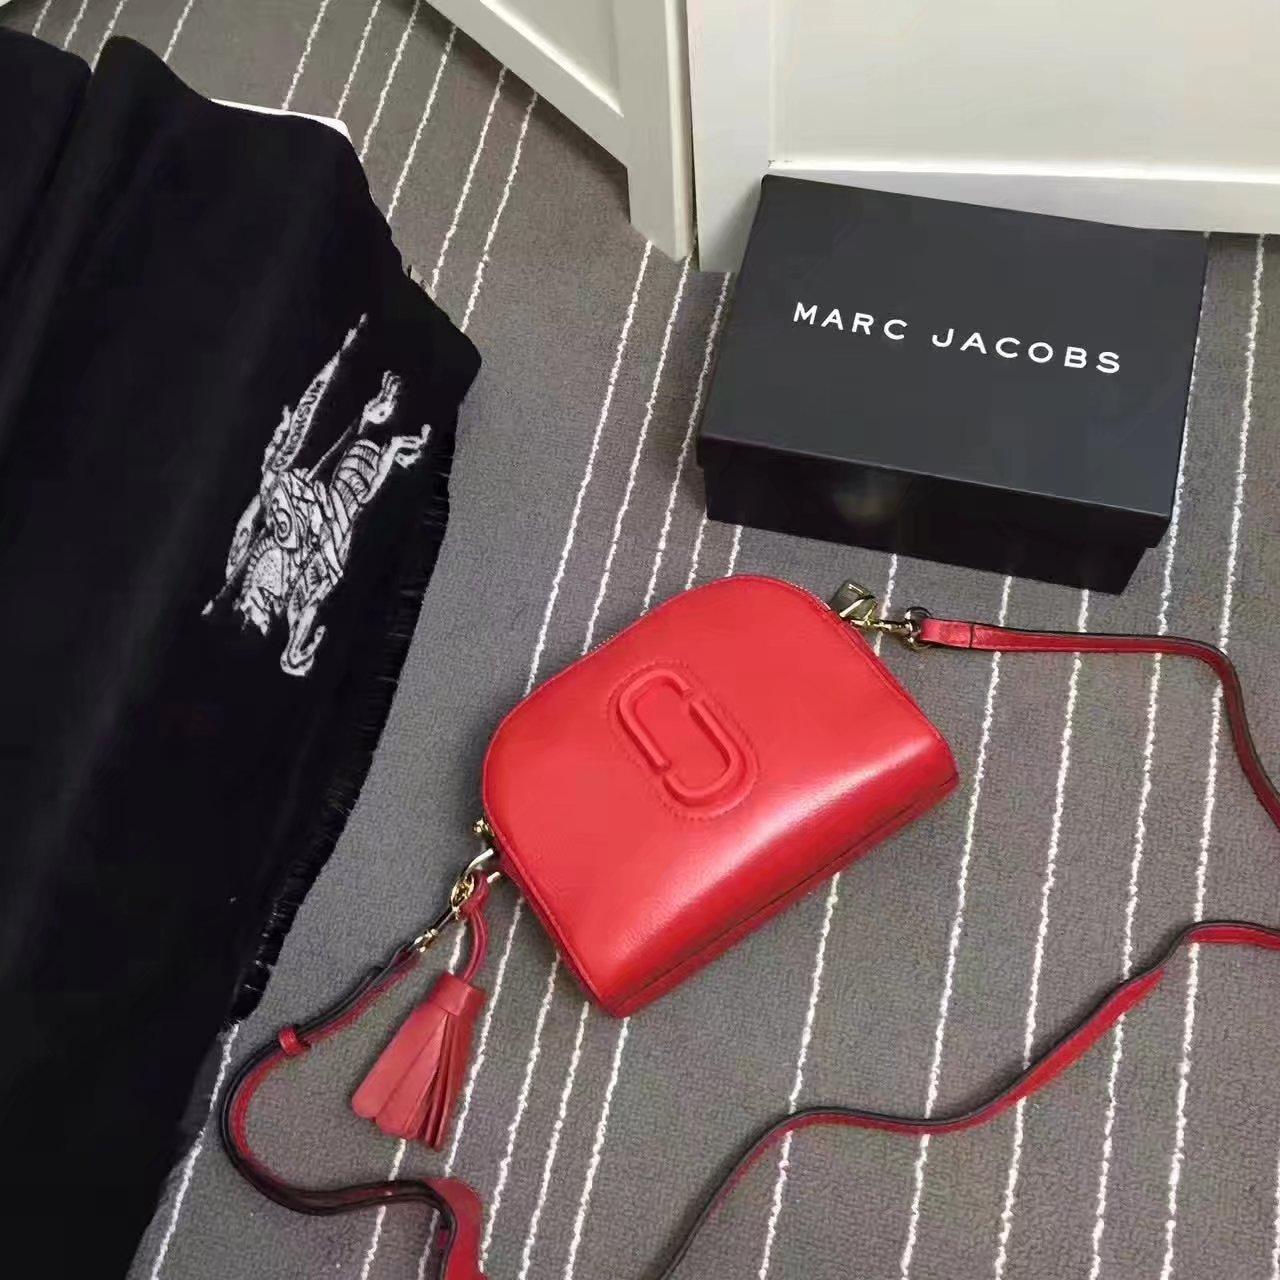 Marc Jacobs Shutter Camera Bag Red